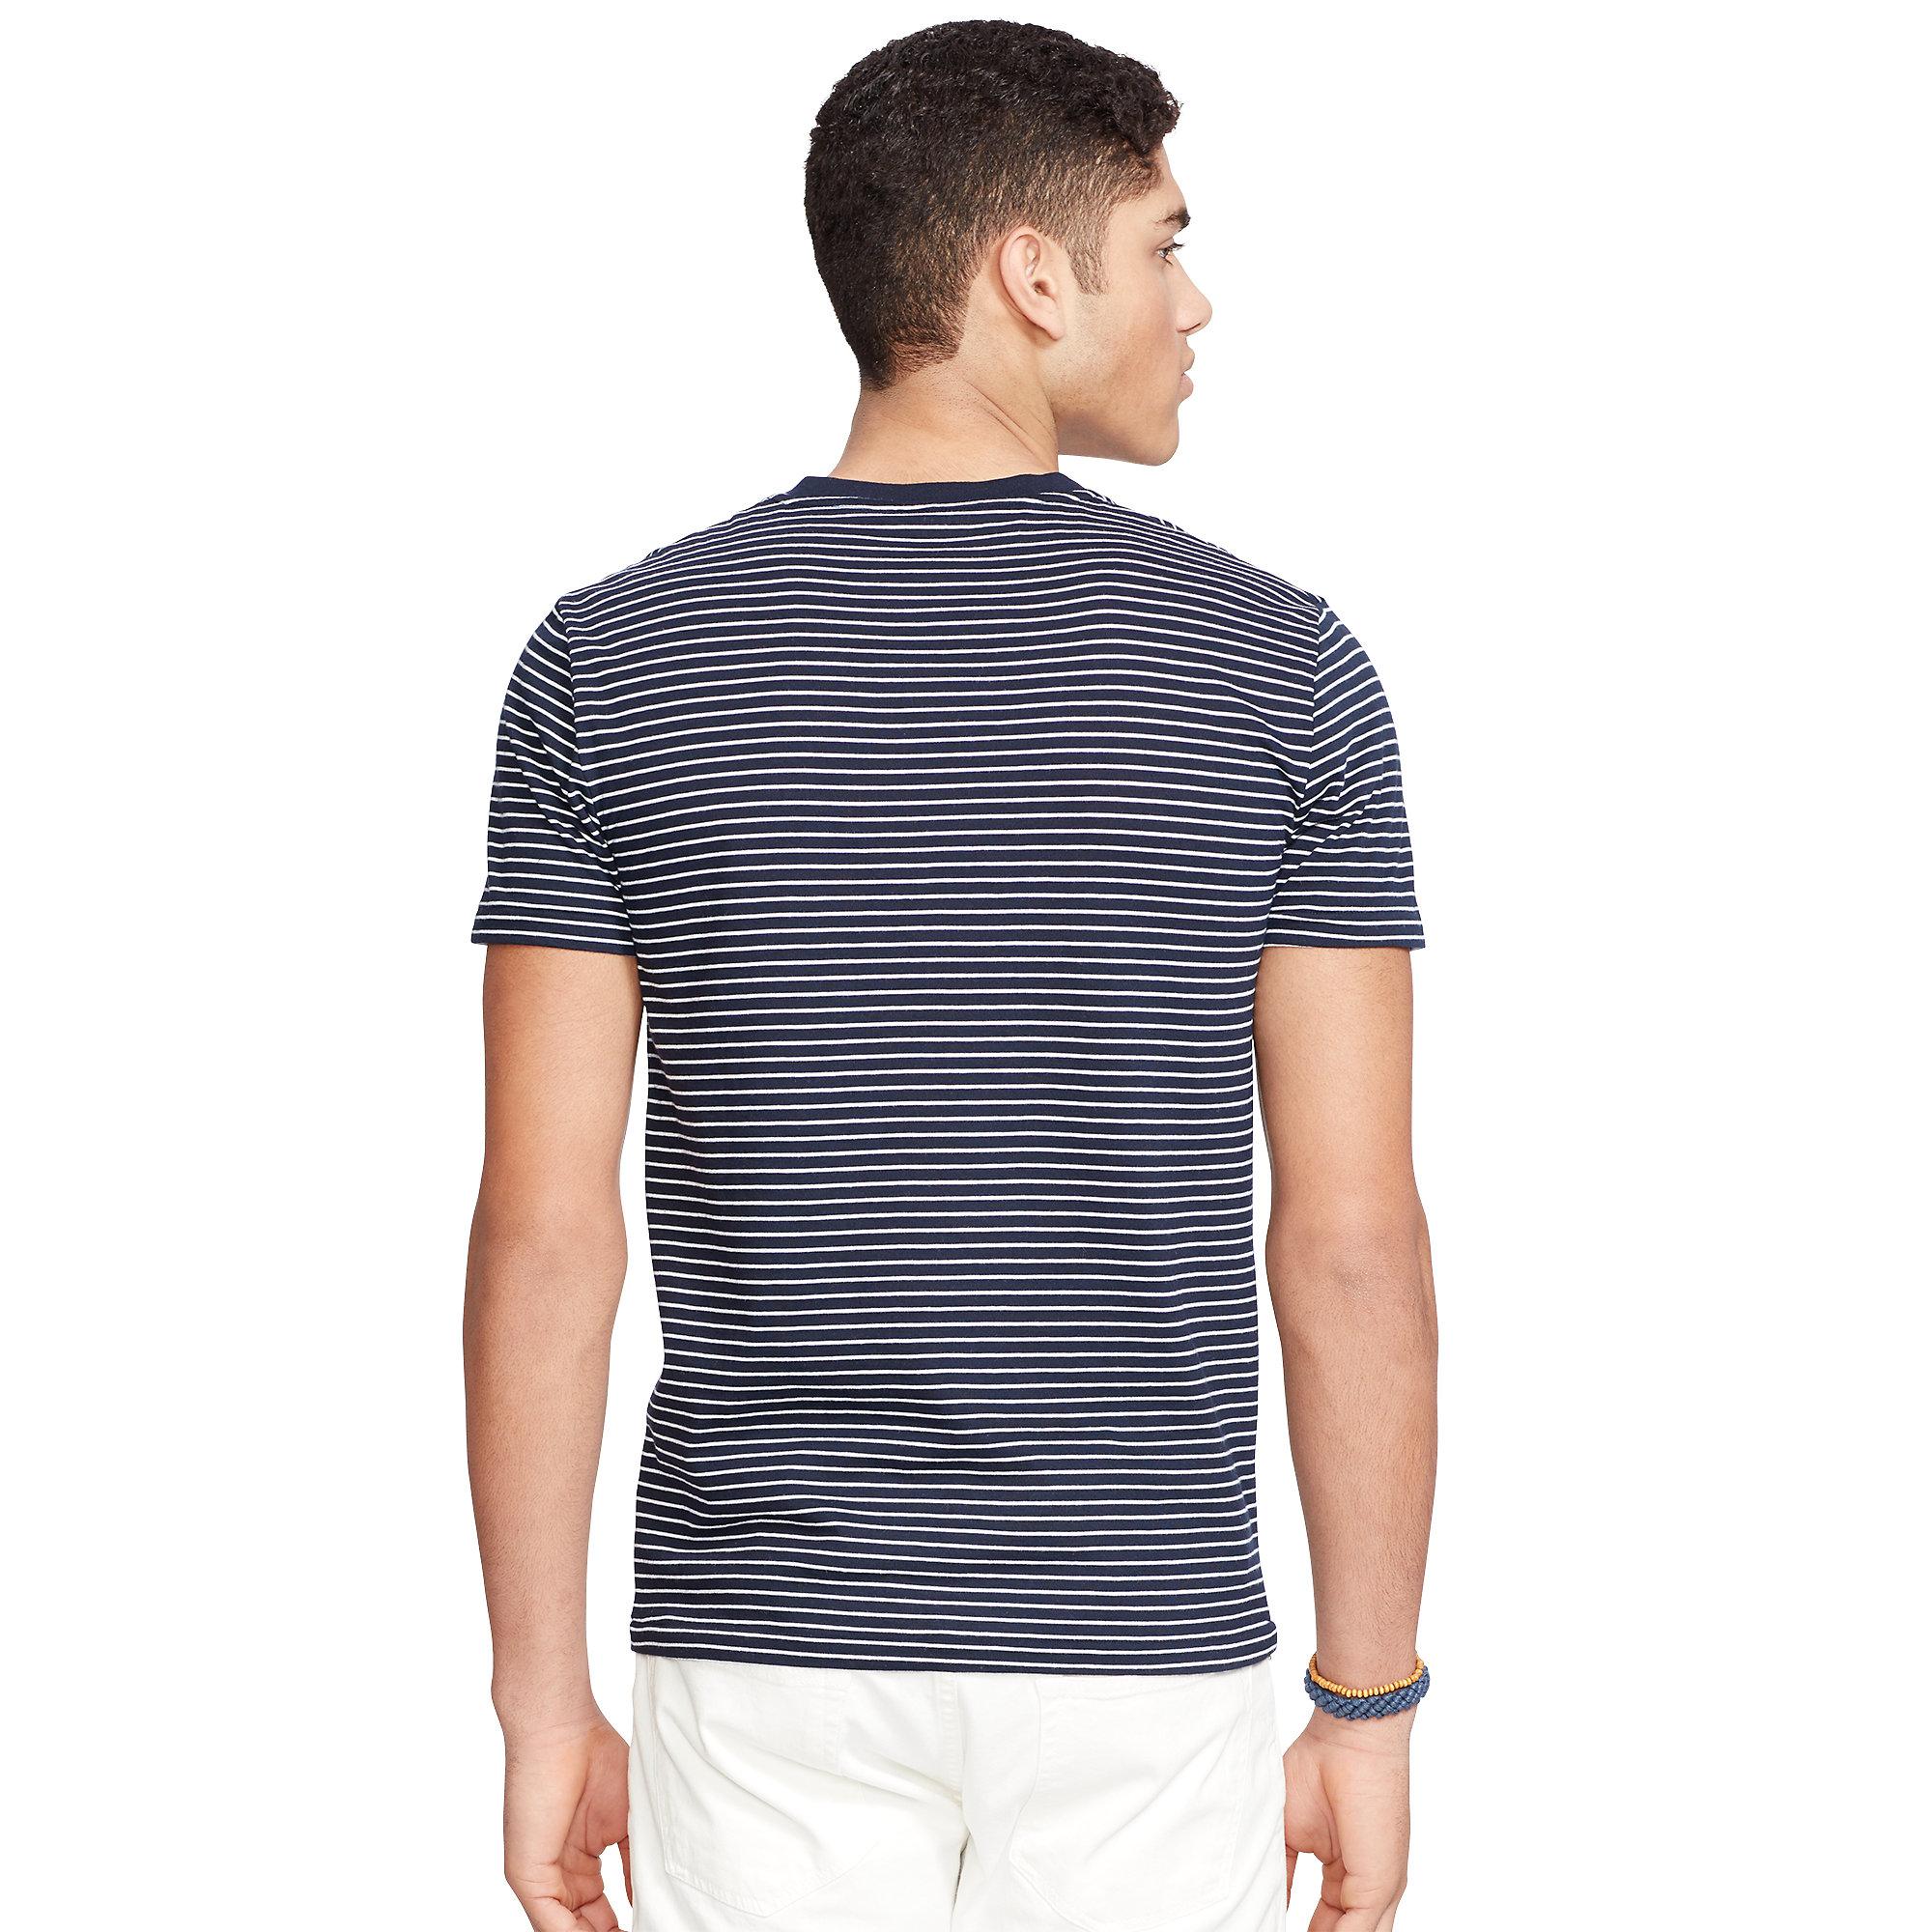 Polo ralph lauren custom fit striped t shirt in white for for Polo custom fit t shirts